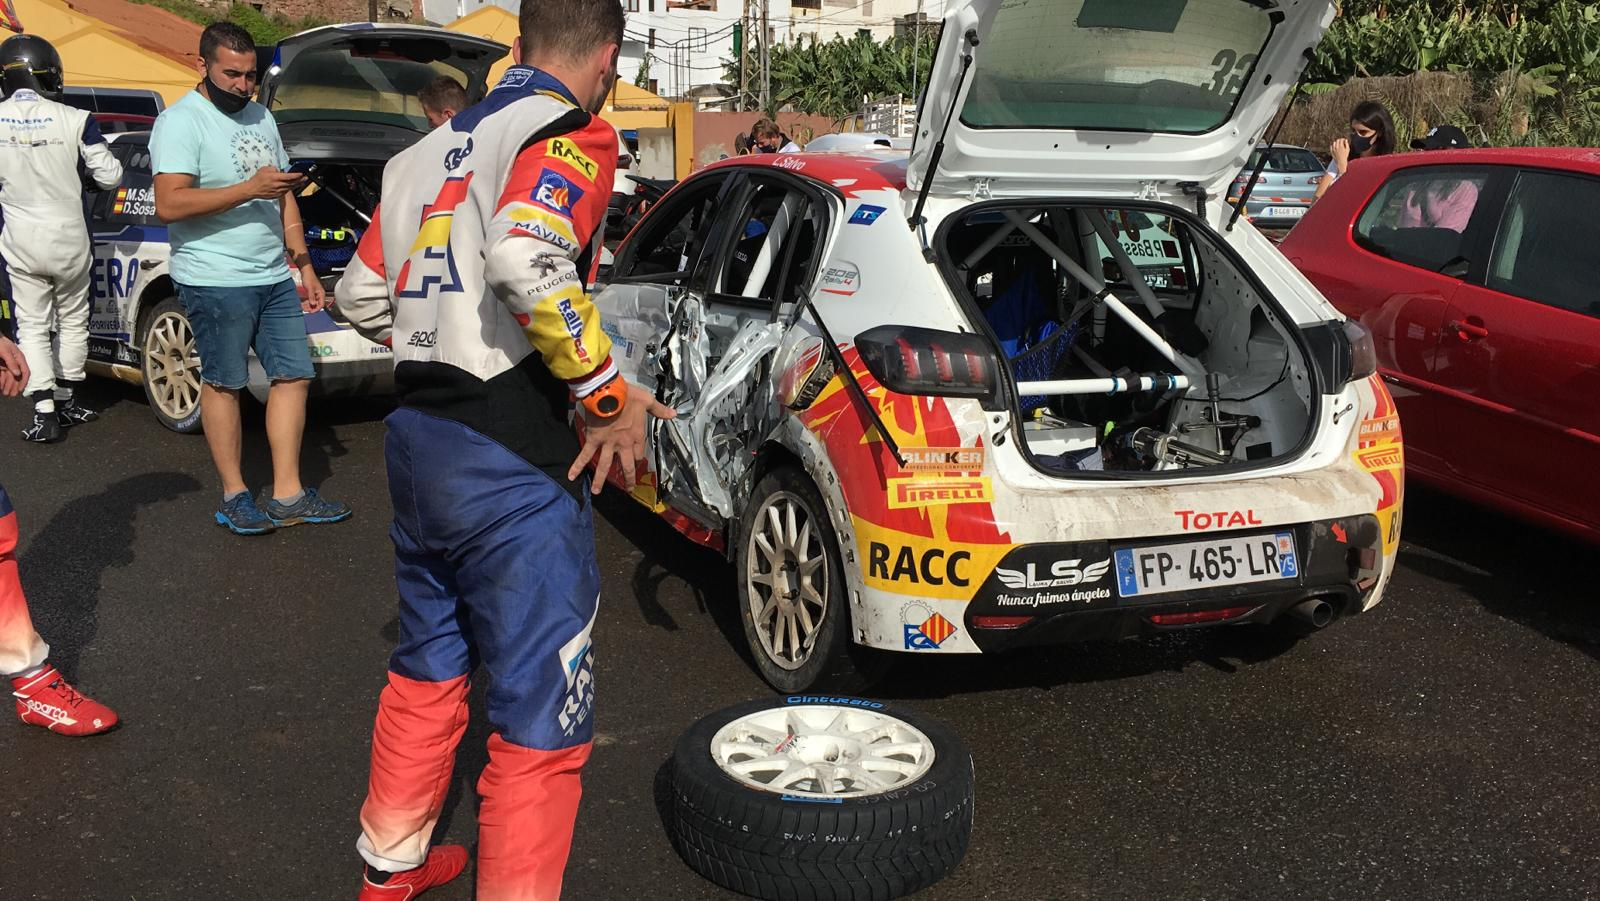 ERC + SCER + CERA: 44º Rallye Islas Canarias [26-28 Noviembre] - Página 7 En6CYDKXYAMYyMp?format=jpg&name=large